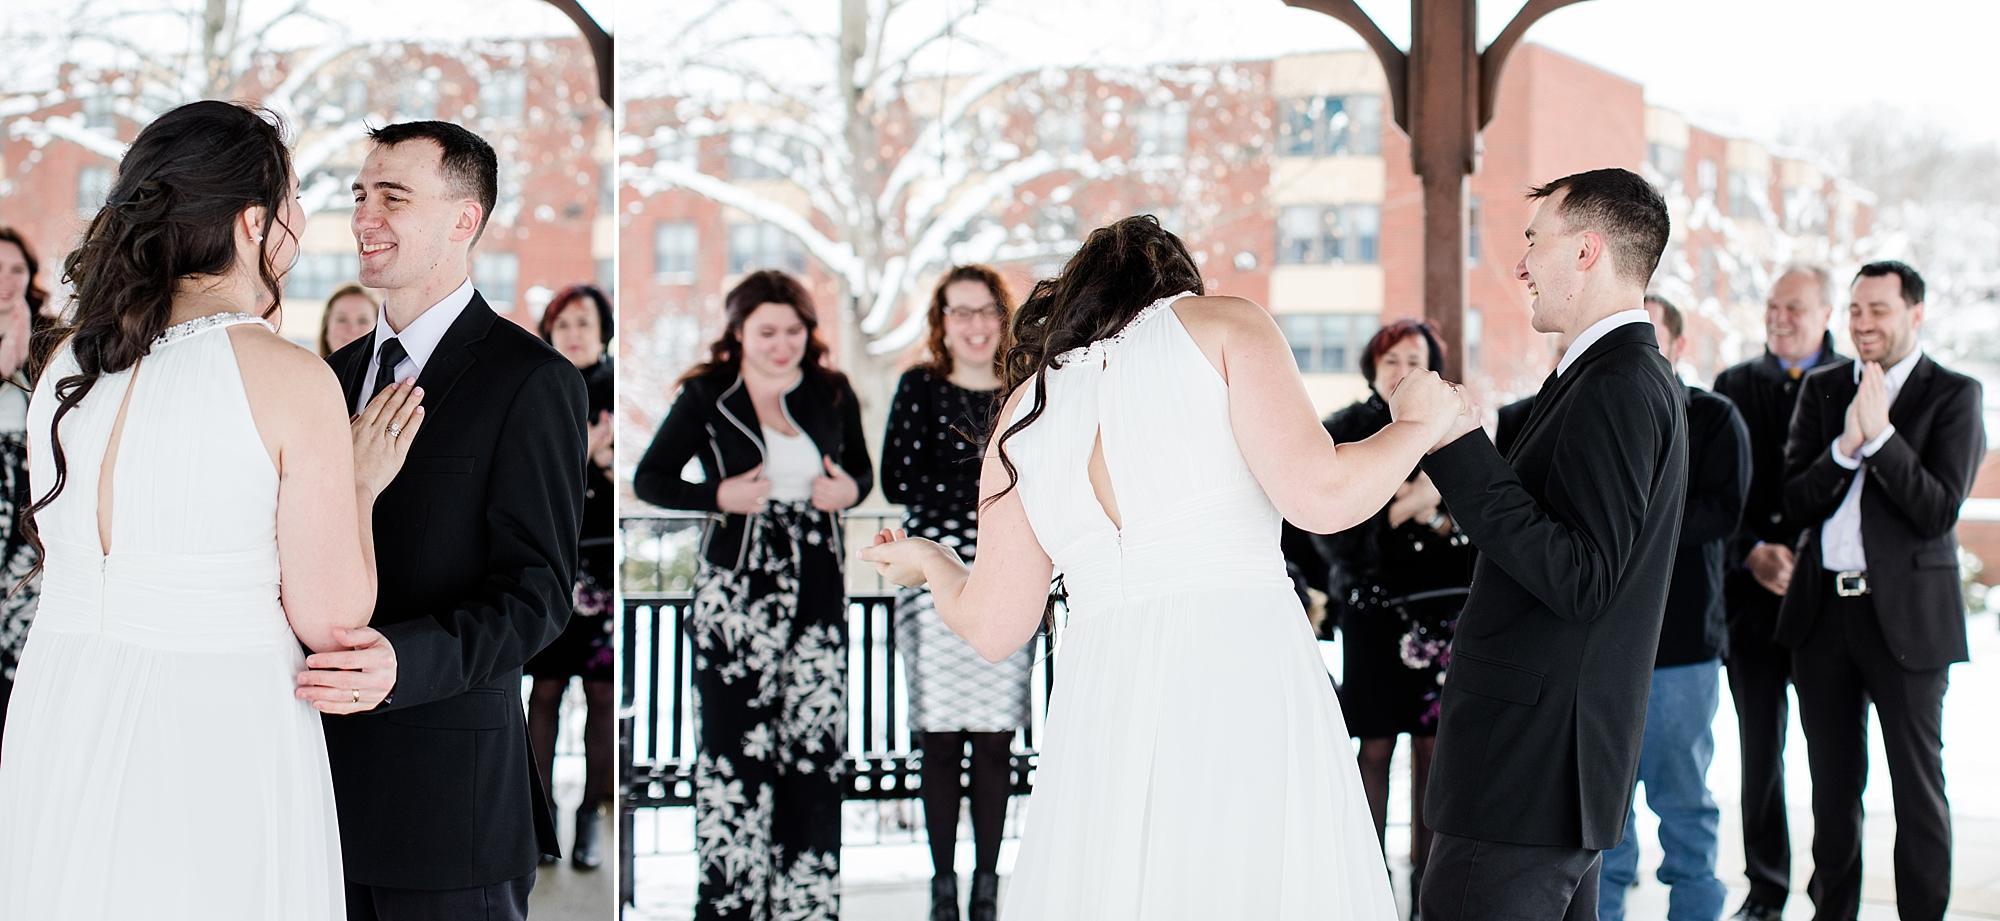 eisleyimages-downtown-marlboro-wedding-newengland_0020.jpg